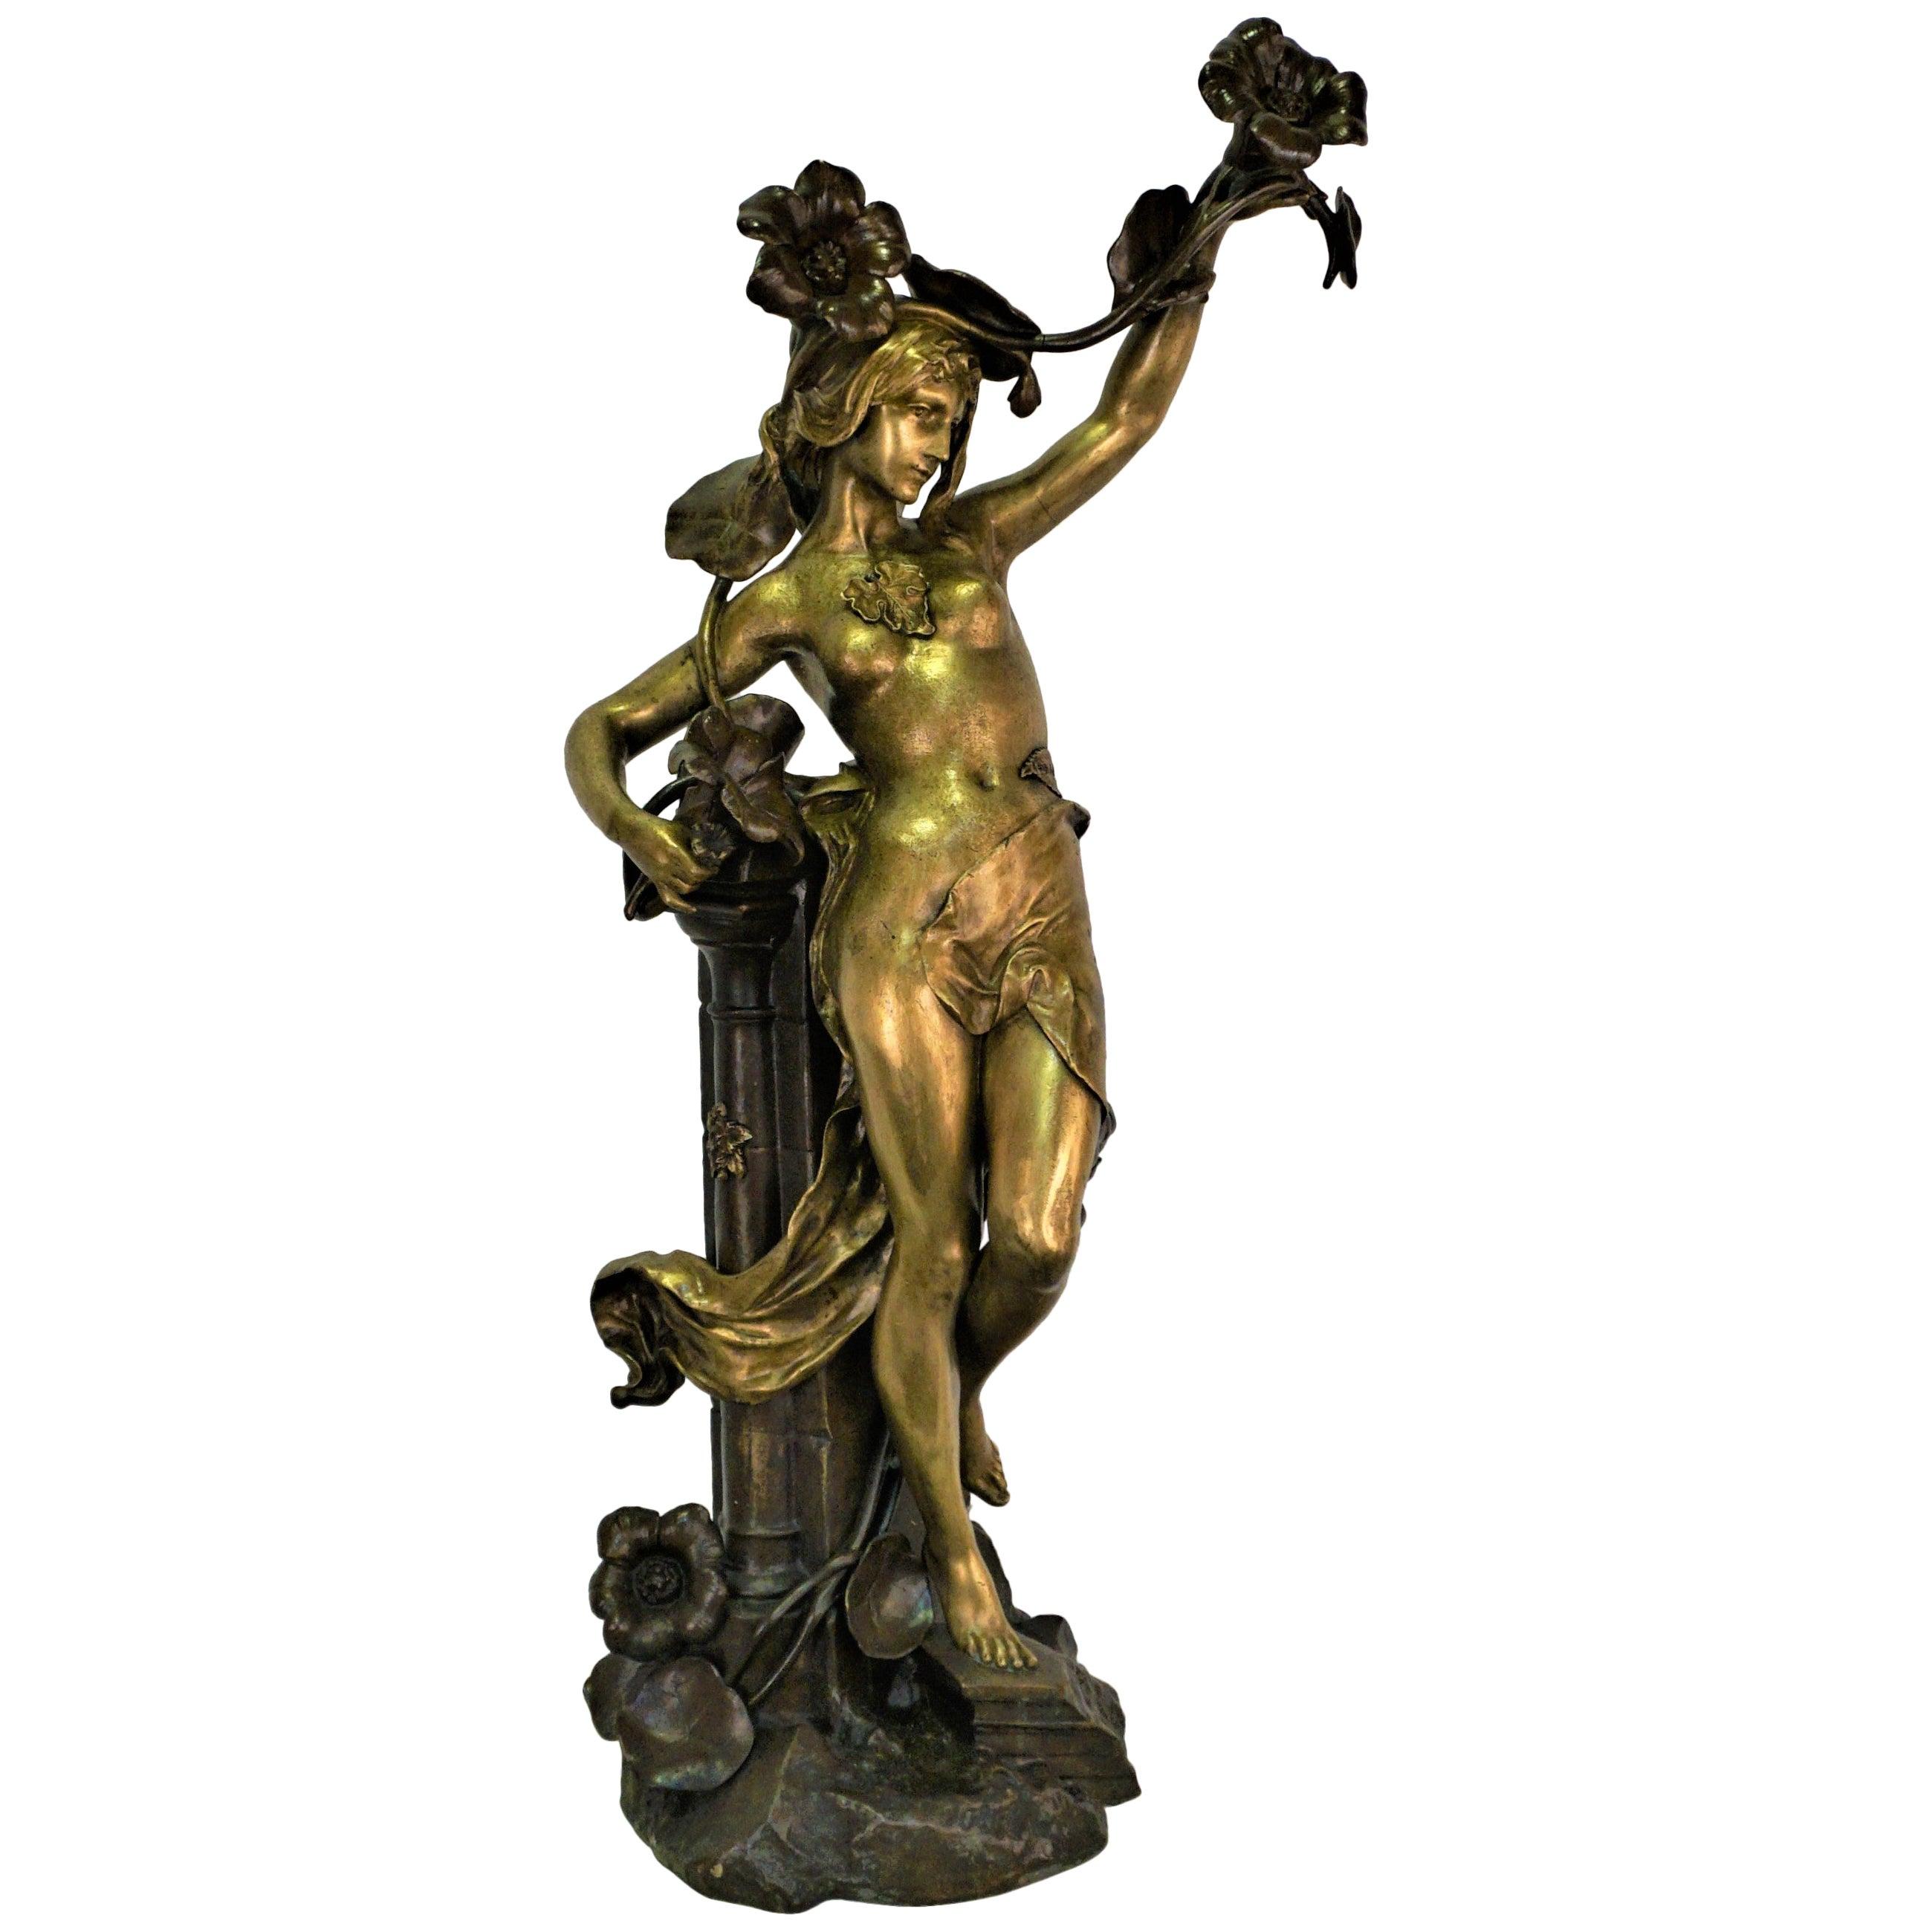 French Art Nouveau Bronze Sculpture of Nude Woman